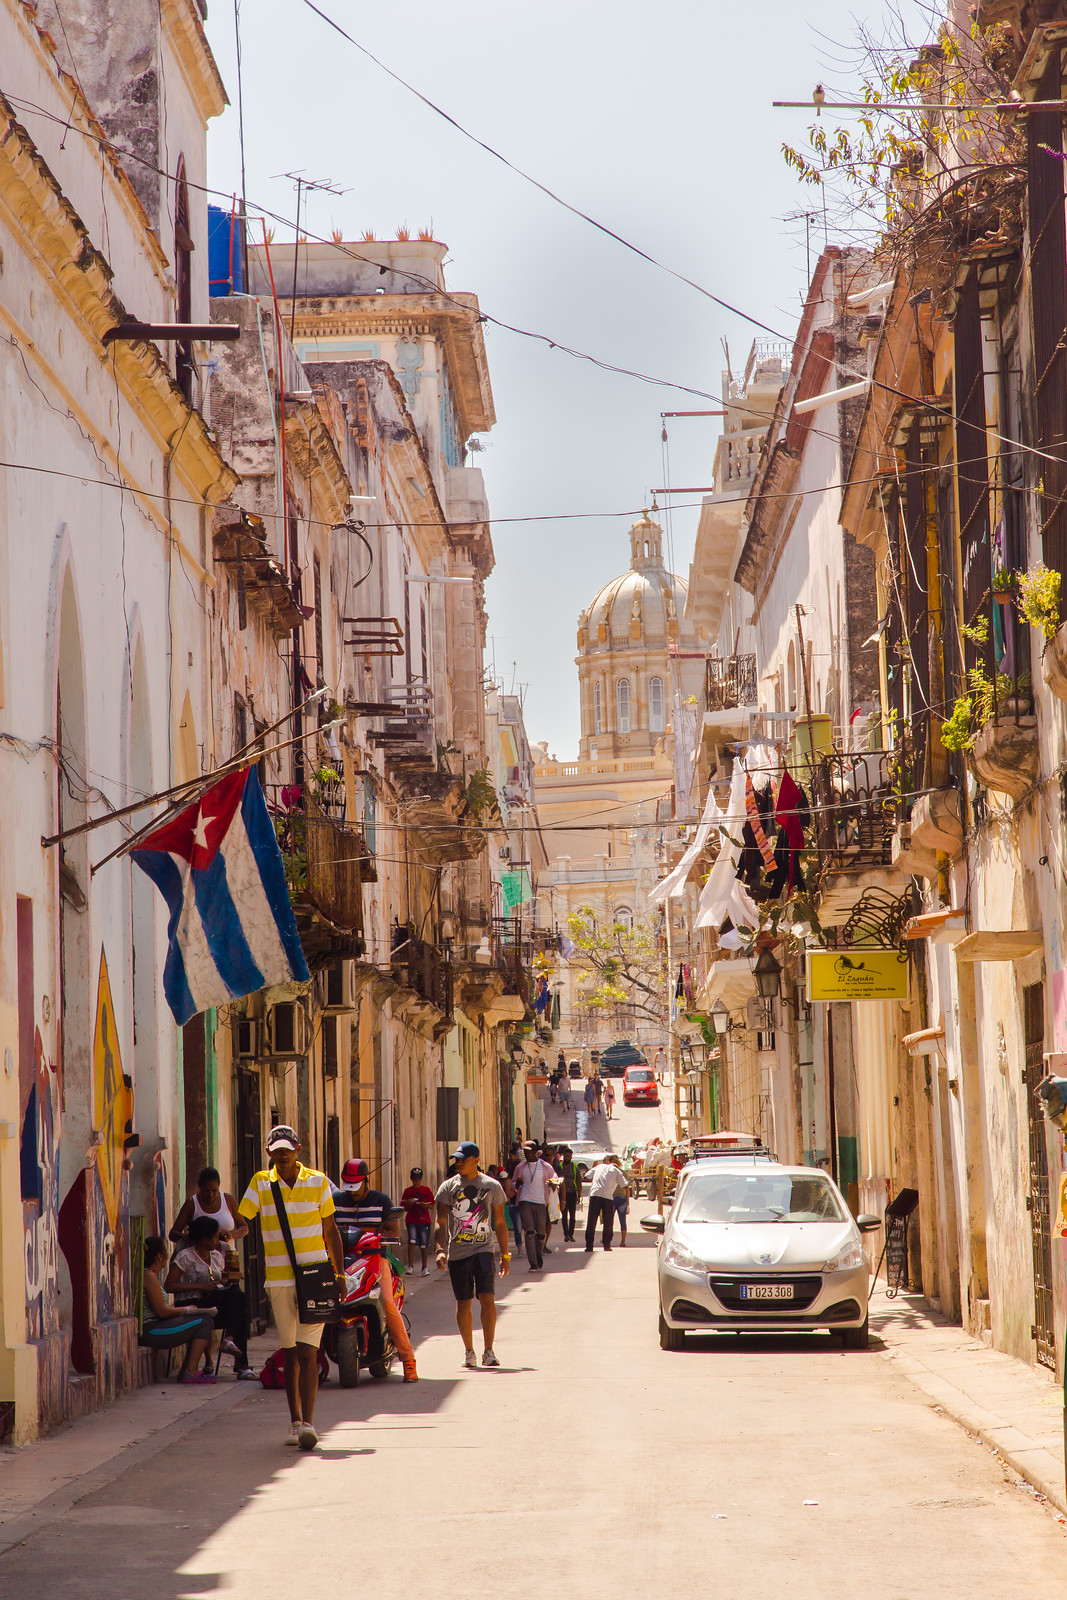 10 Things to do in Havana